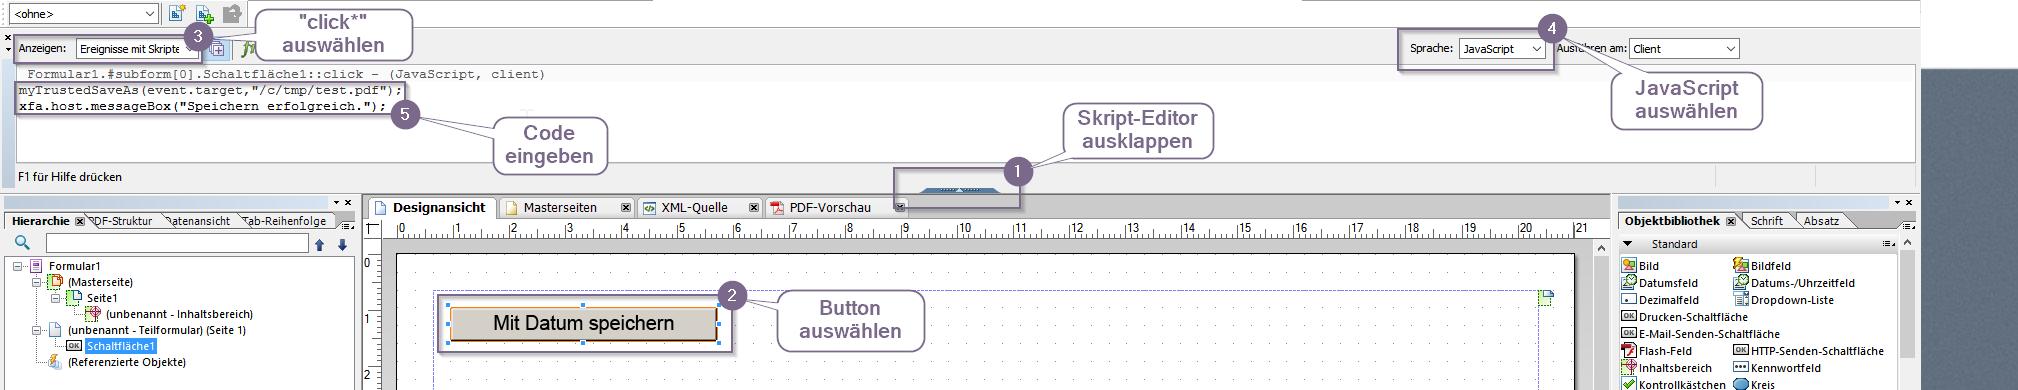 Adobe Formular